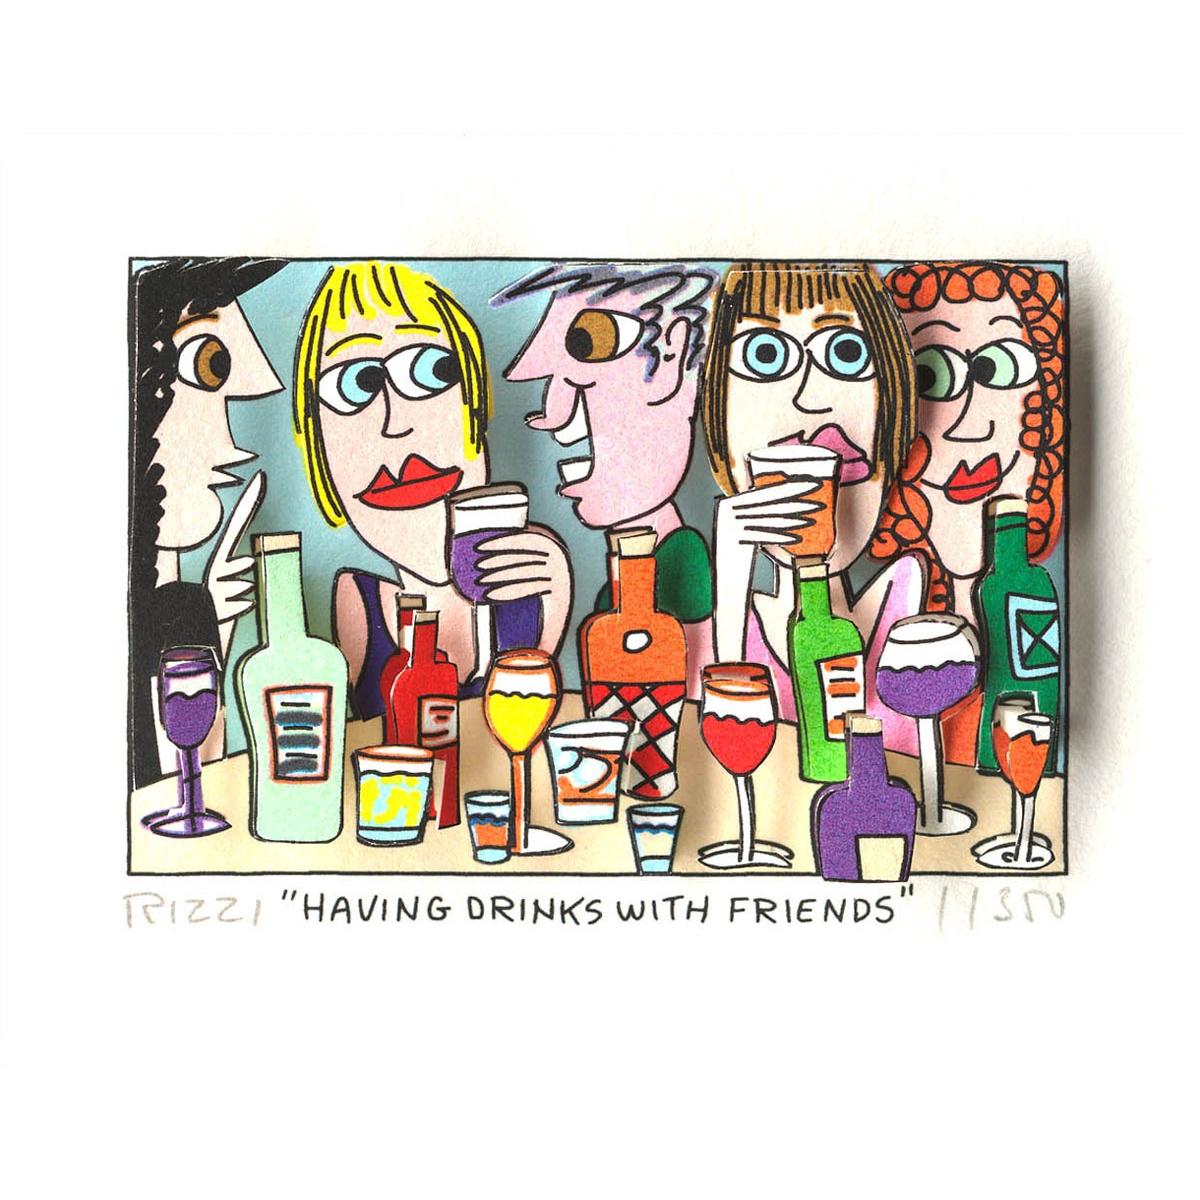 Having drinks with friends von James Rizzi